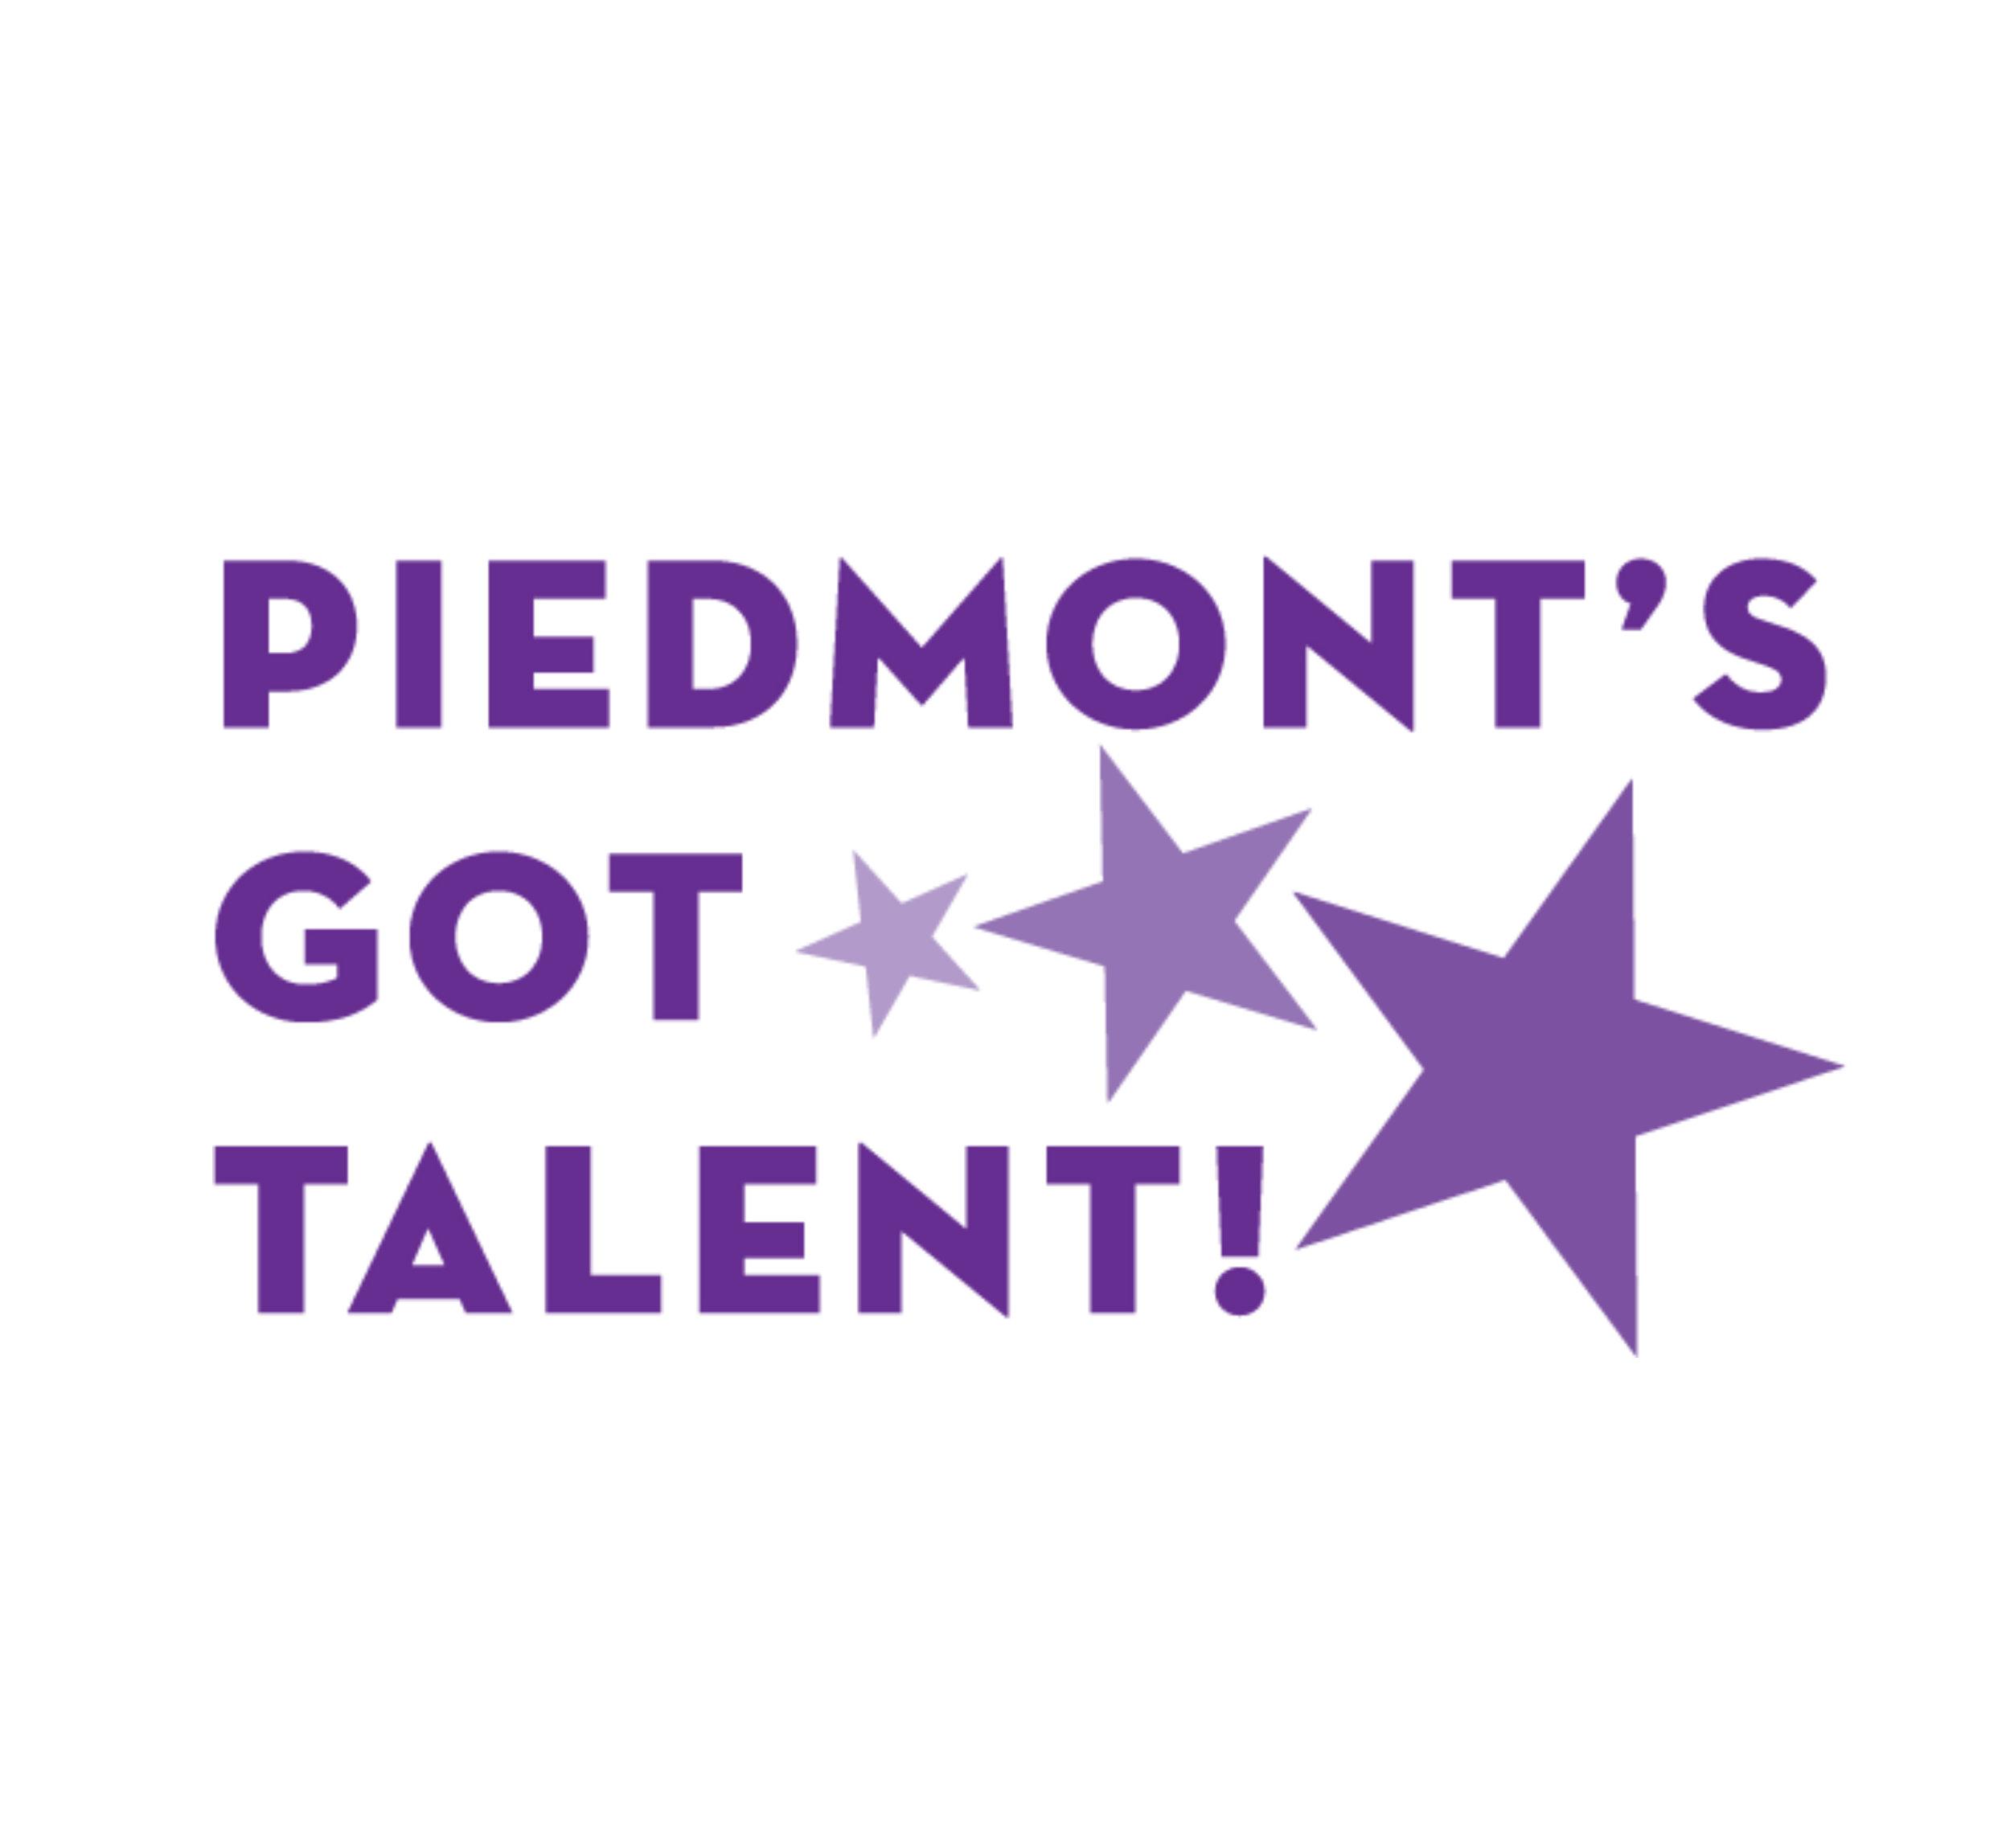 PiedmontsGotTalent-LOGOb-2019-SQUARE.jpg